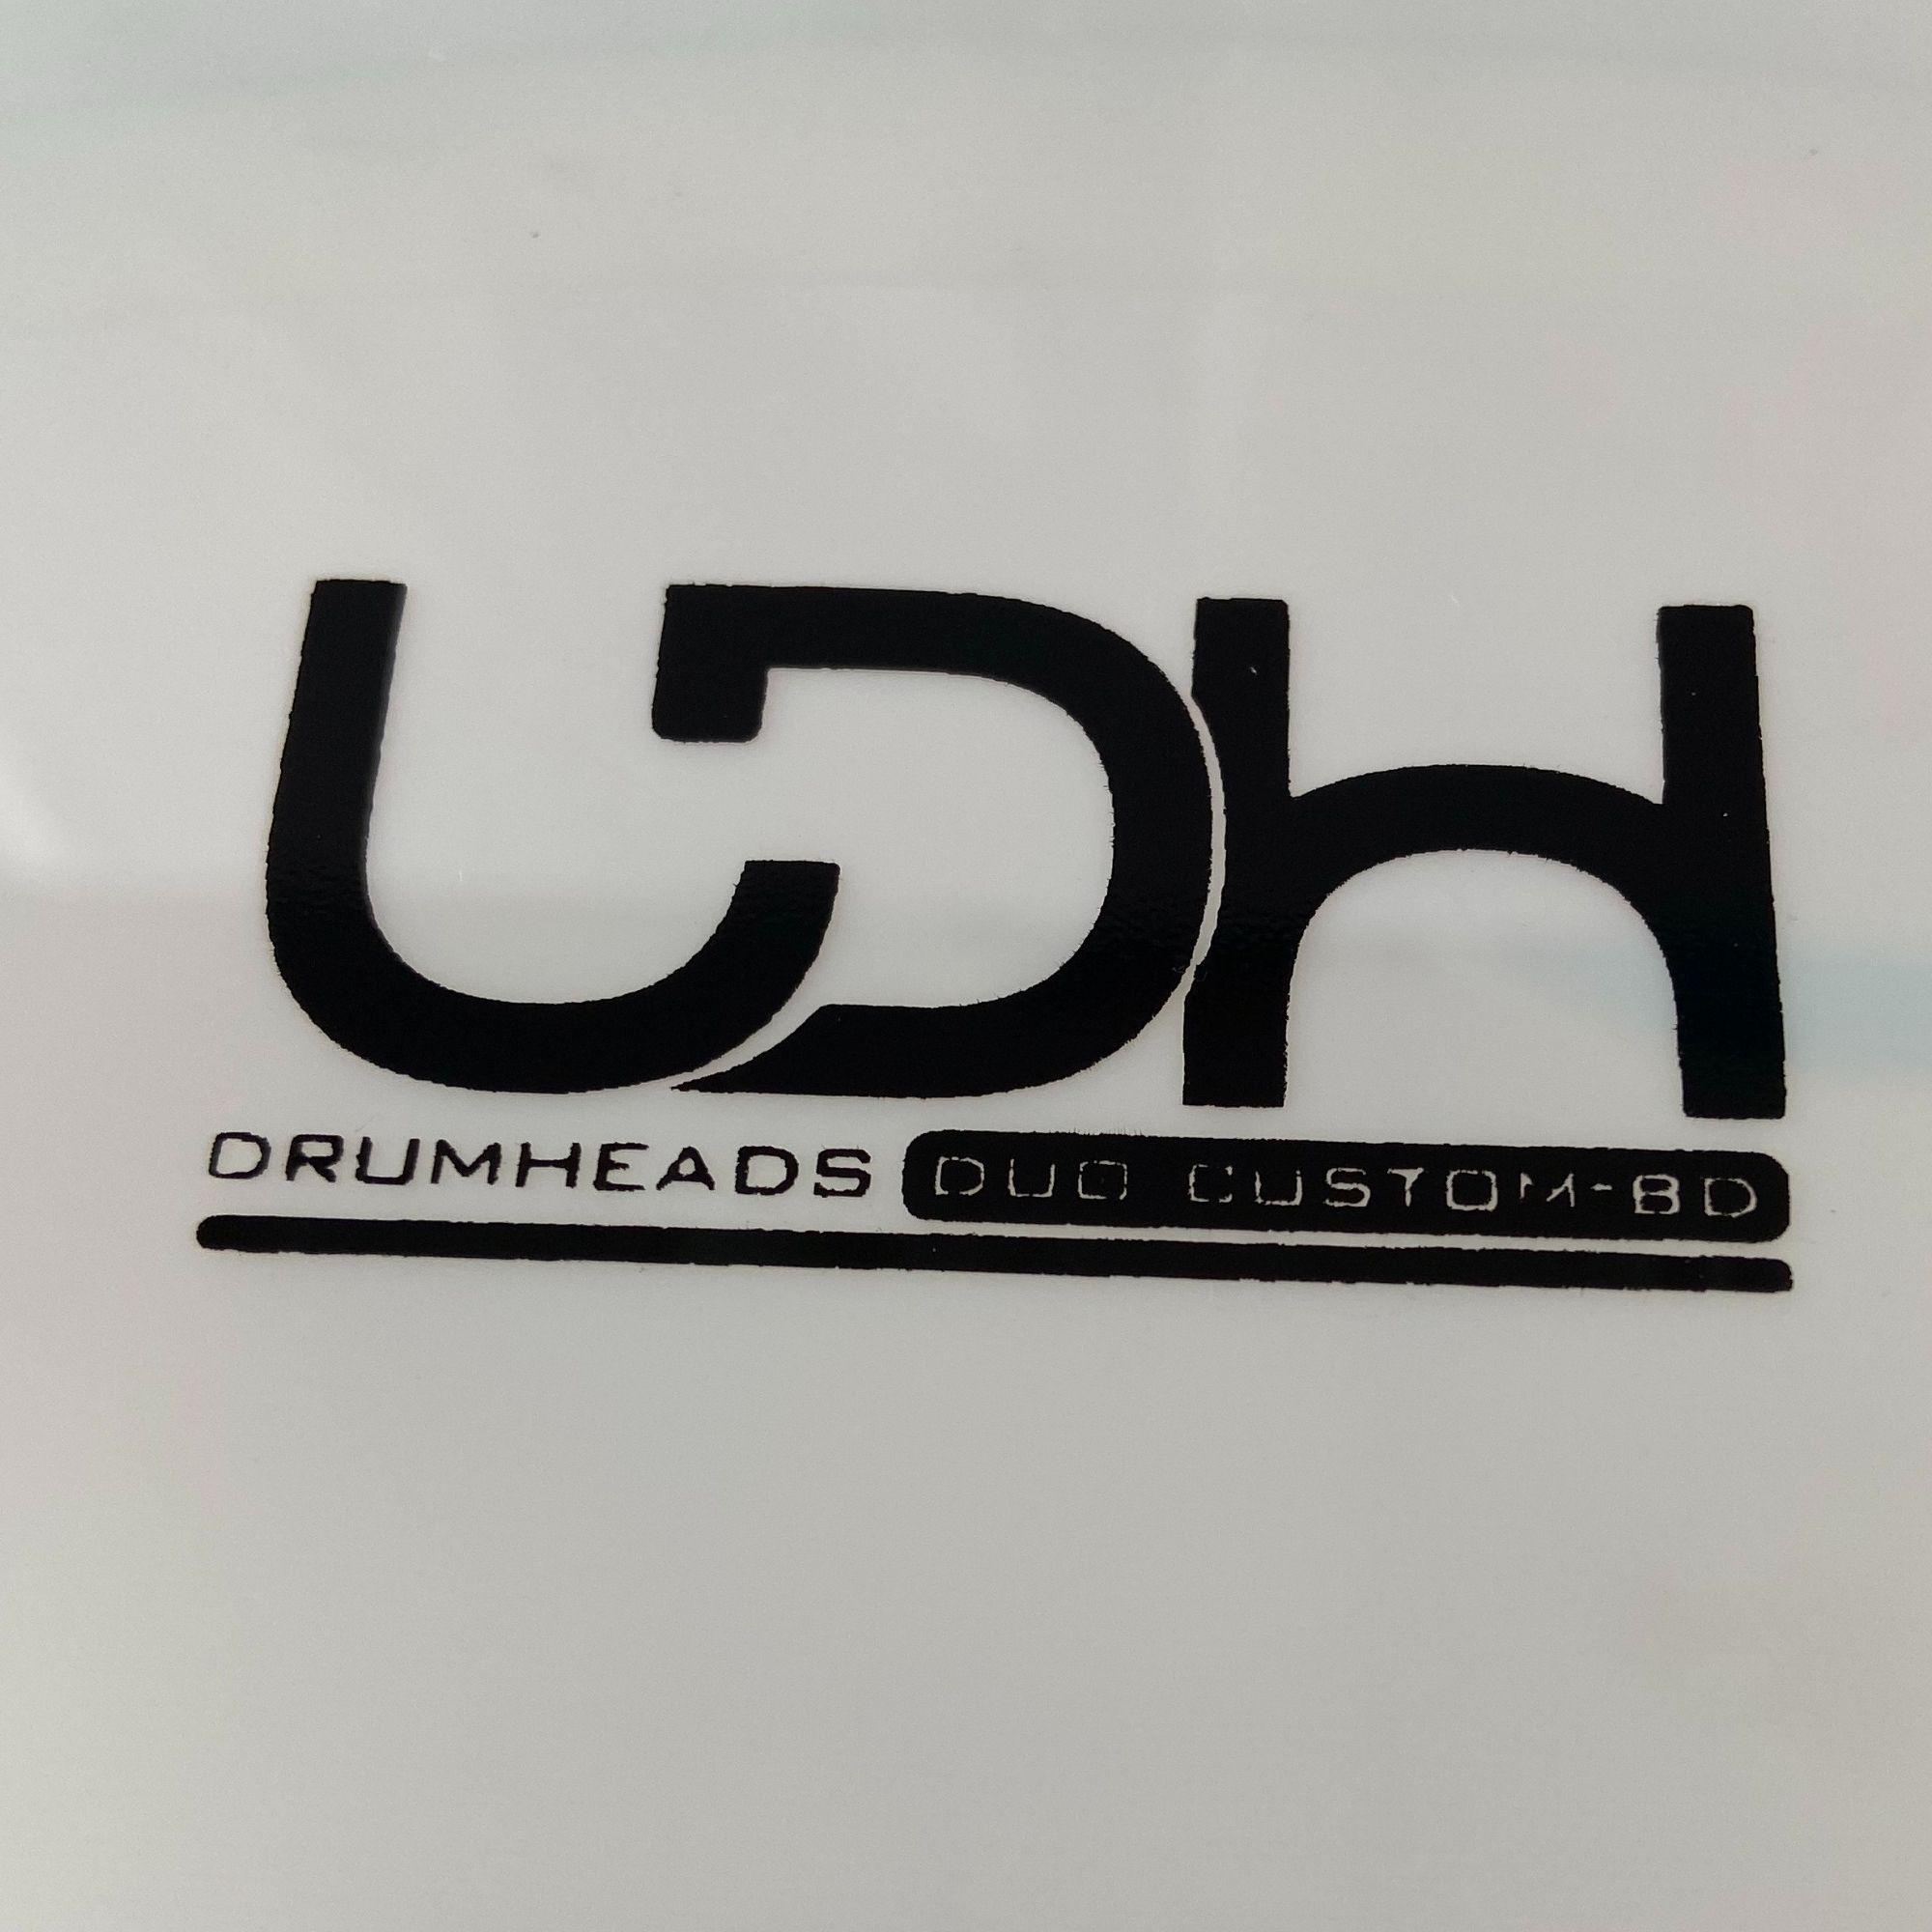 "Pele Batedeira Duo Custom BD Luen Drumheads LDH 22"" para Bumbo de Bateria."